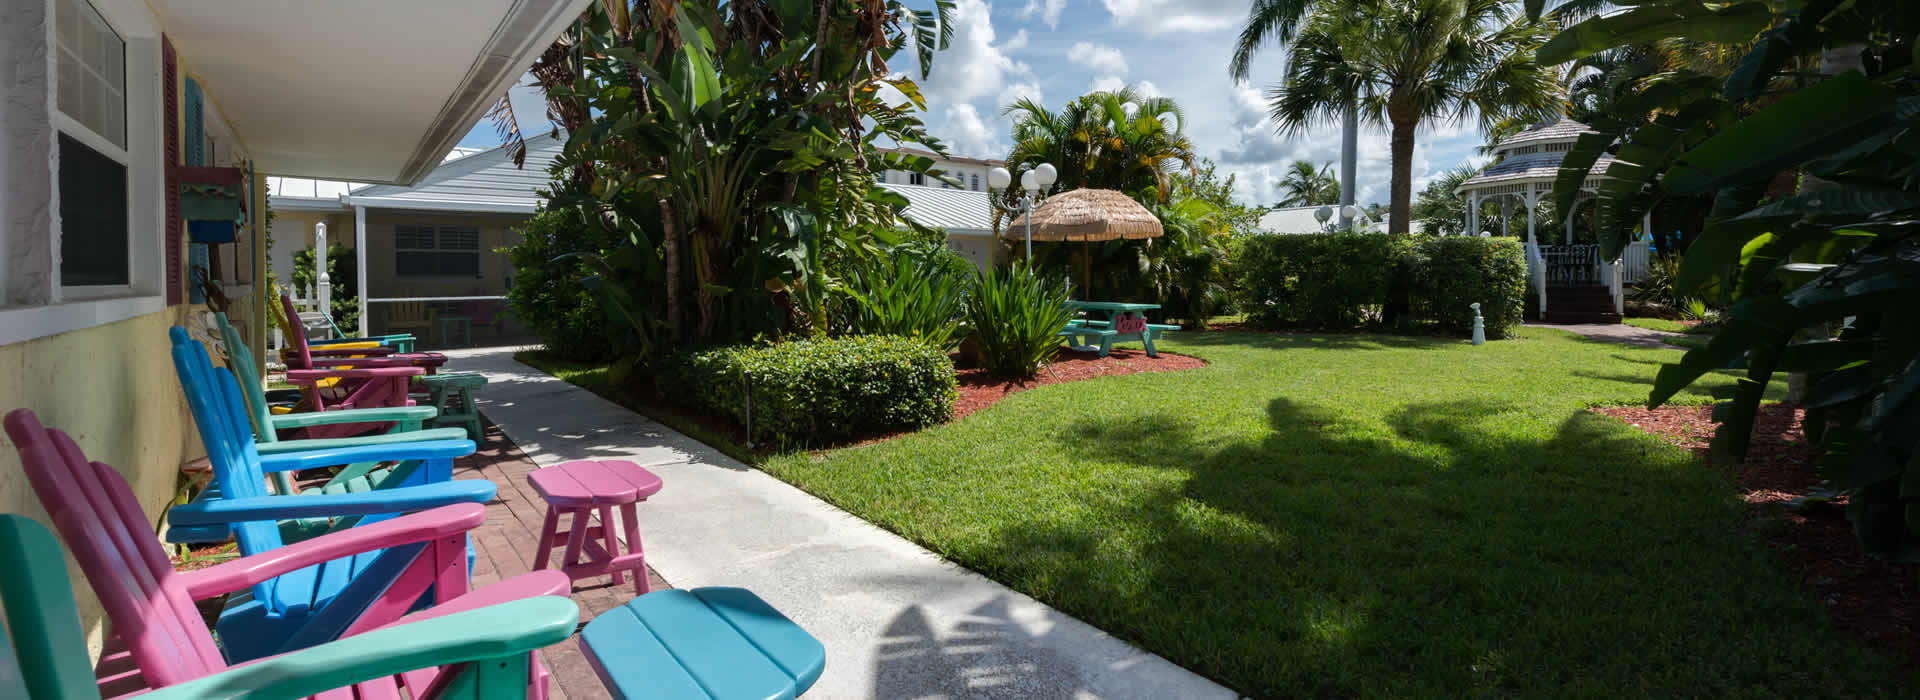 Chairs at Lemon Tree Inn of Florida